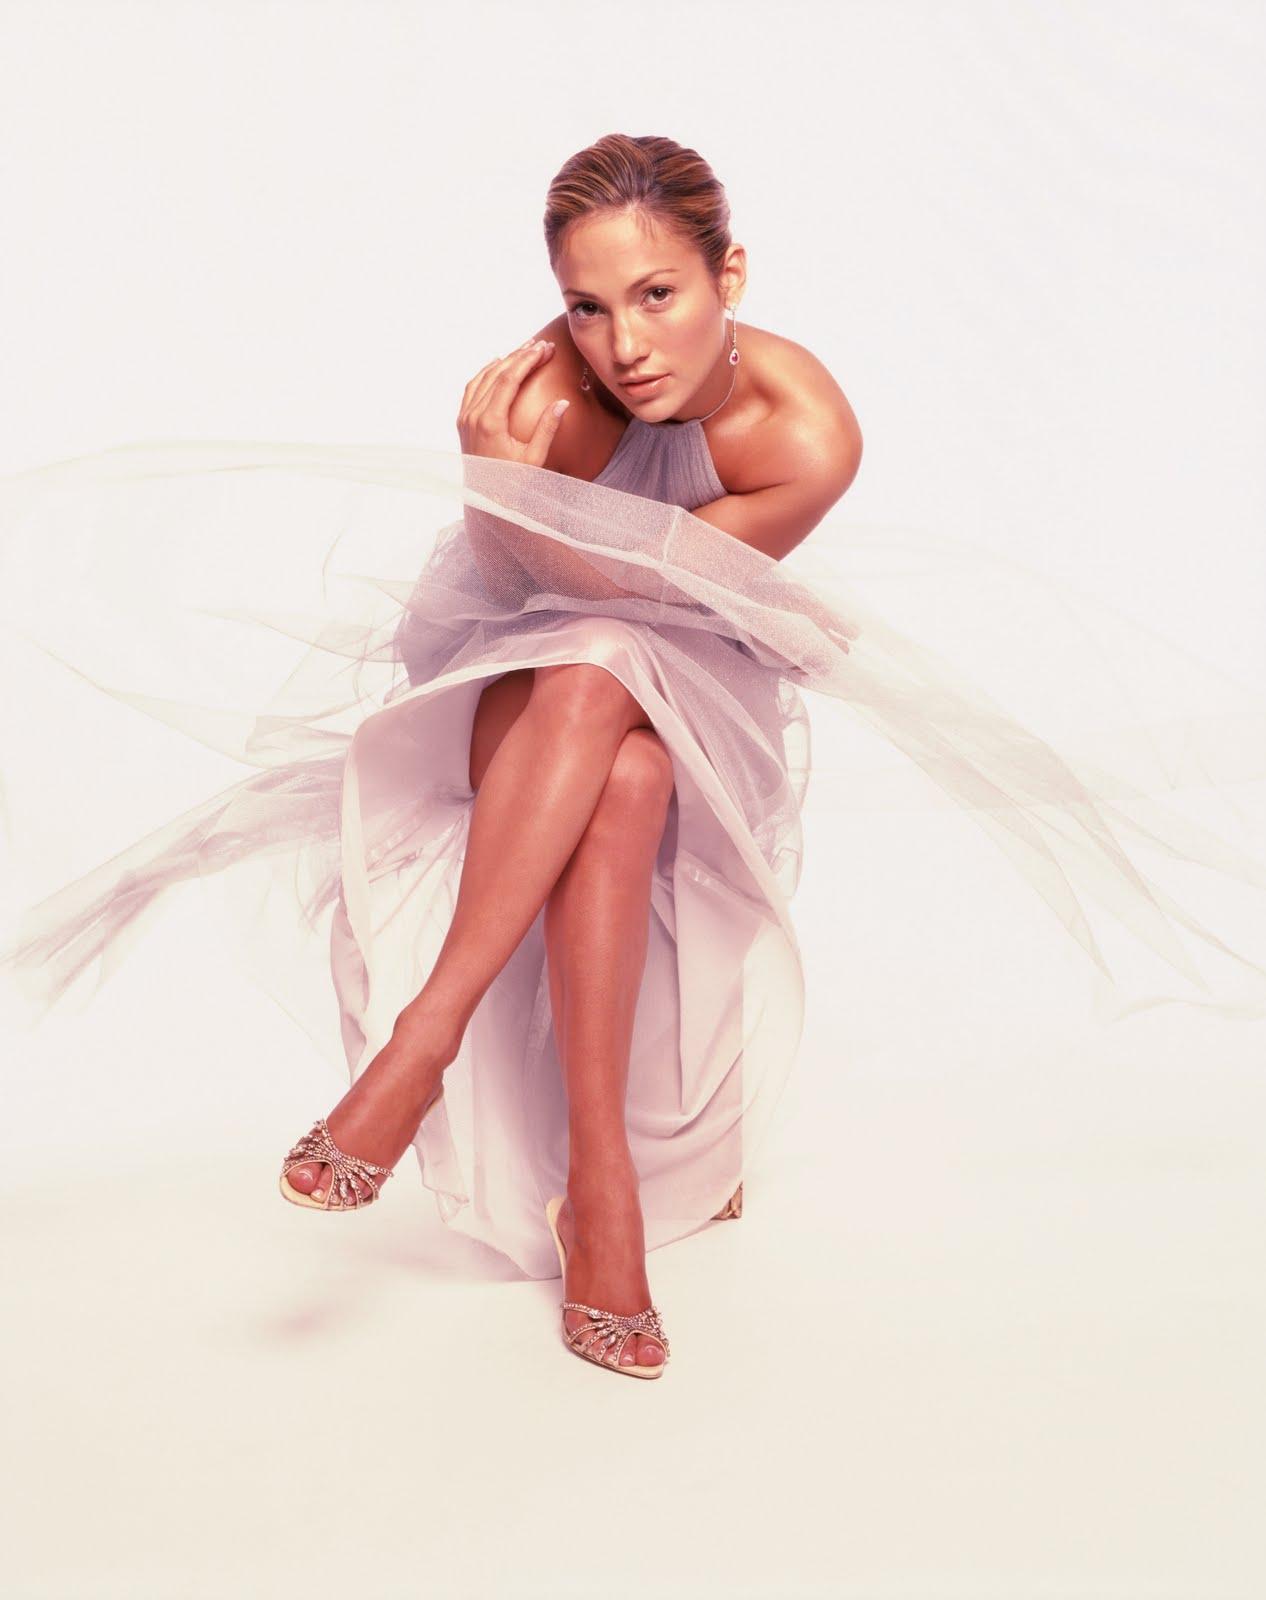 Feet Jennifer Hoffman nudes (85 foto and video), Topless, Cleavage, Instagram, legs 2019